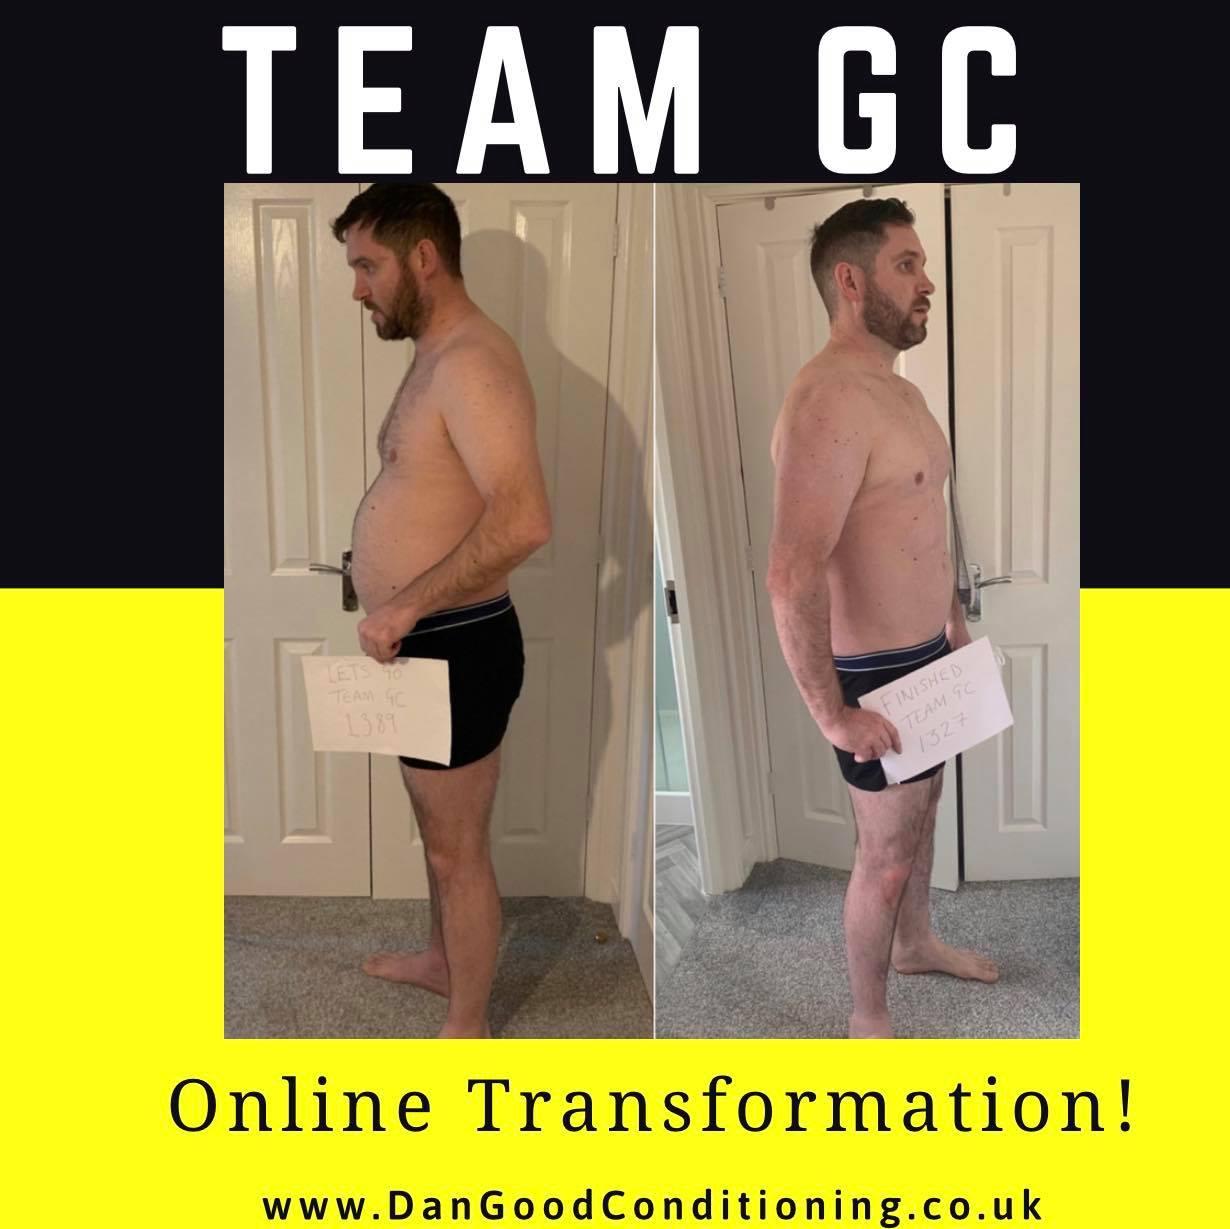 John Chuplis- Team GC Member